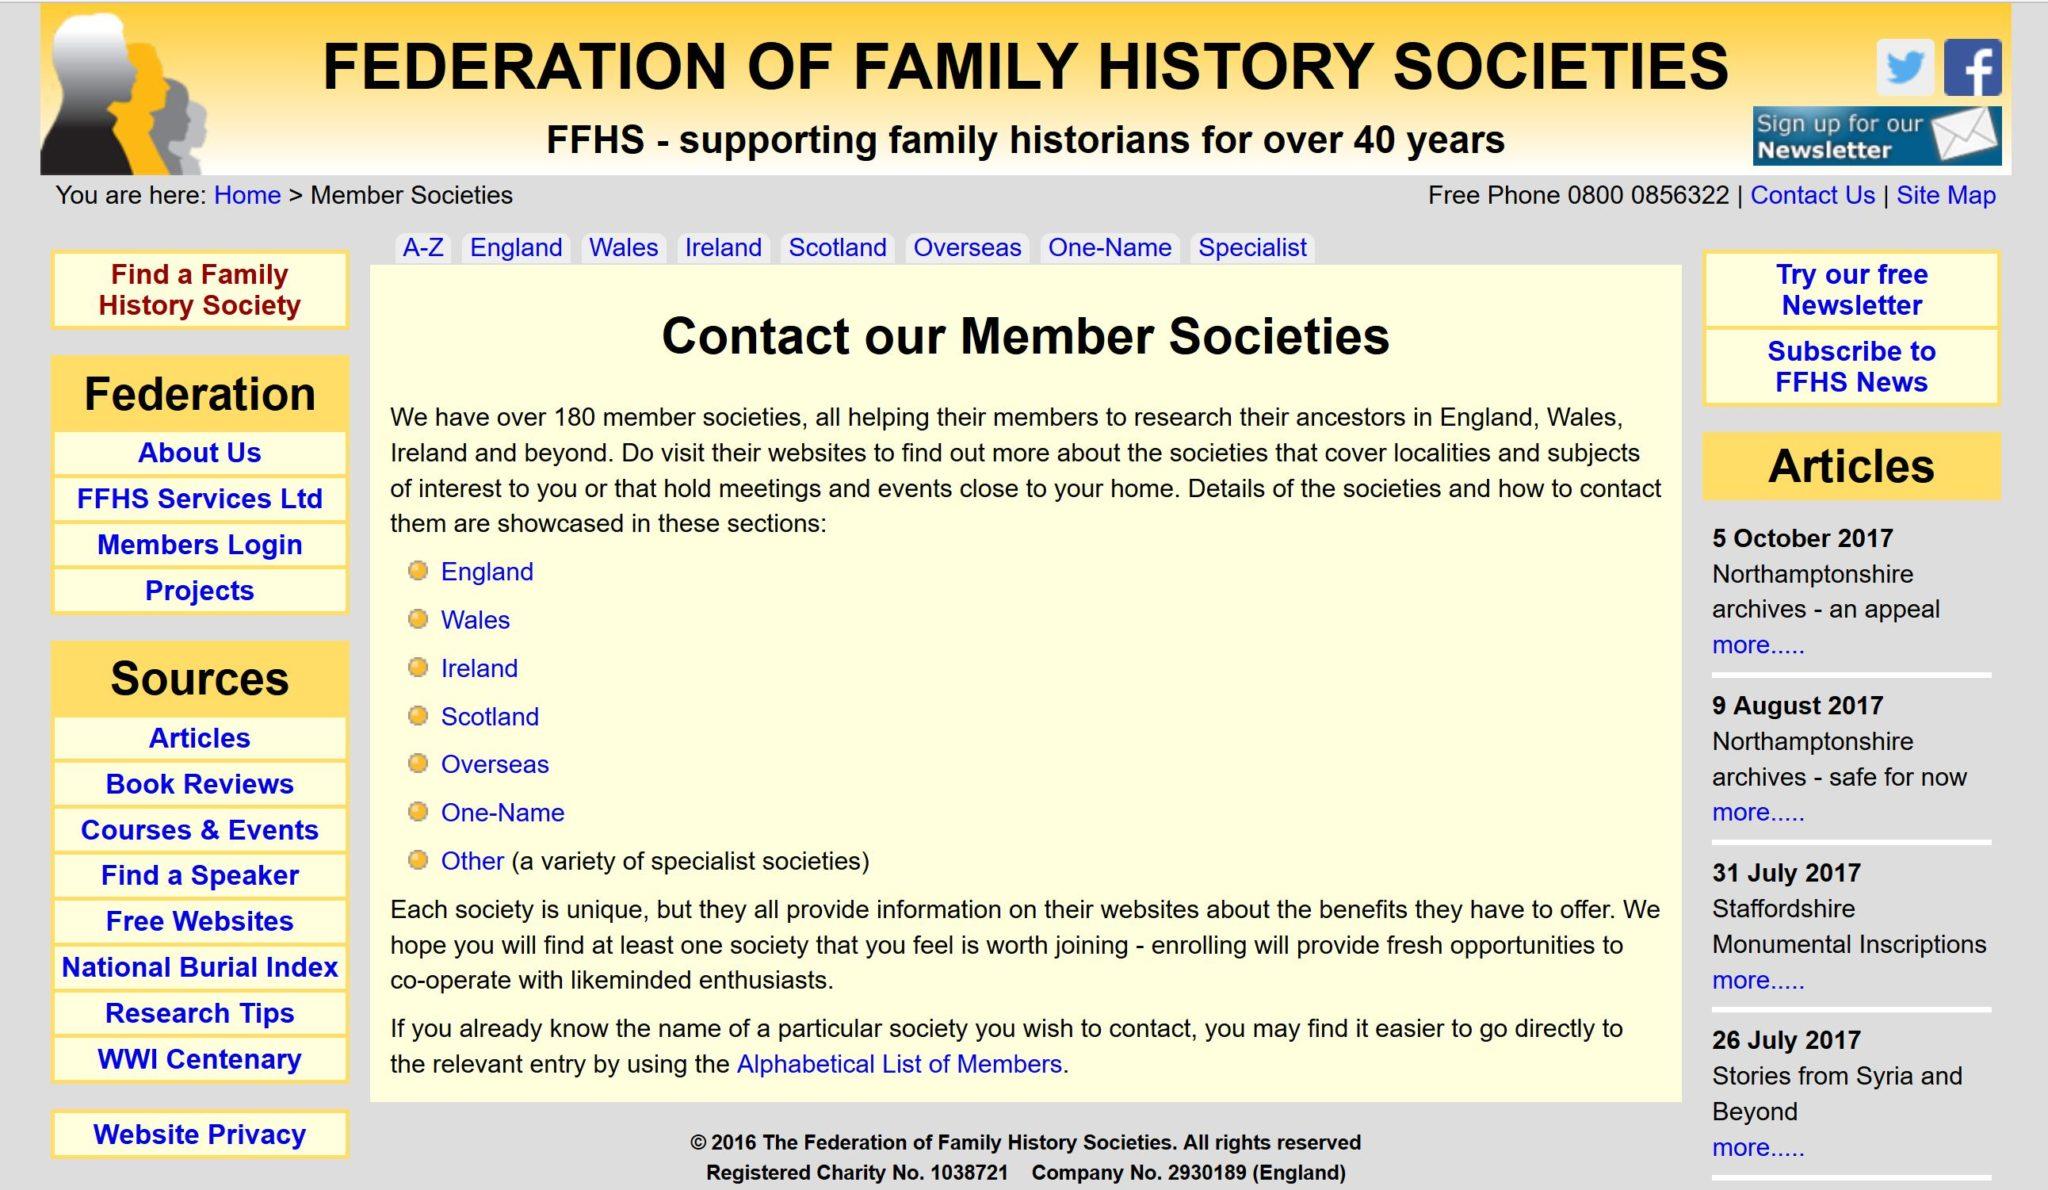 British, Irish, Scottish, Welsh Genealogy Research Guide, Federation of Family History Societies